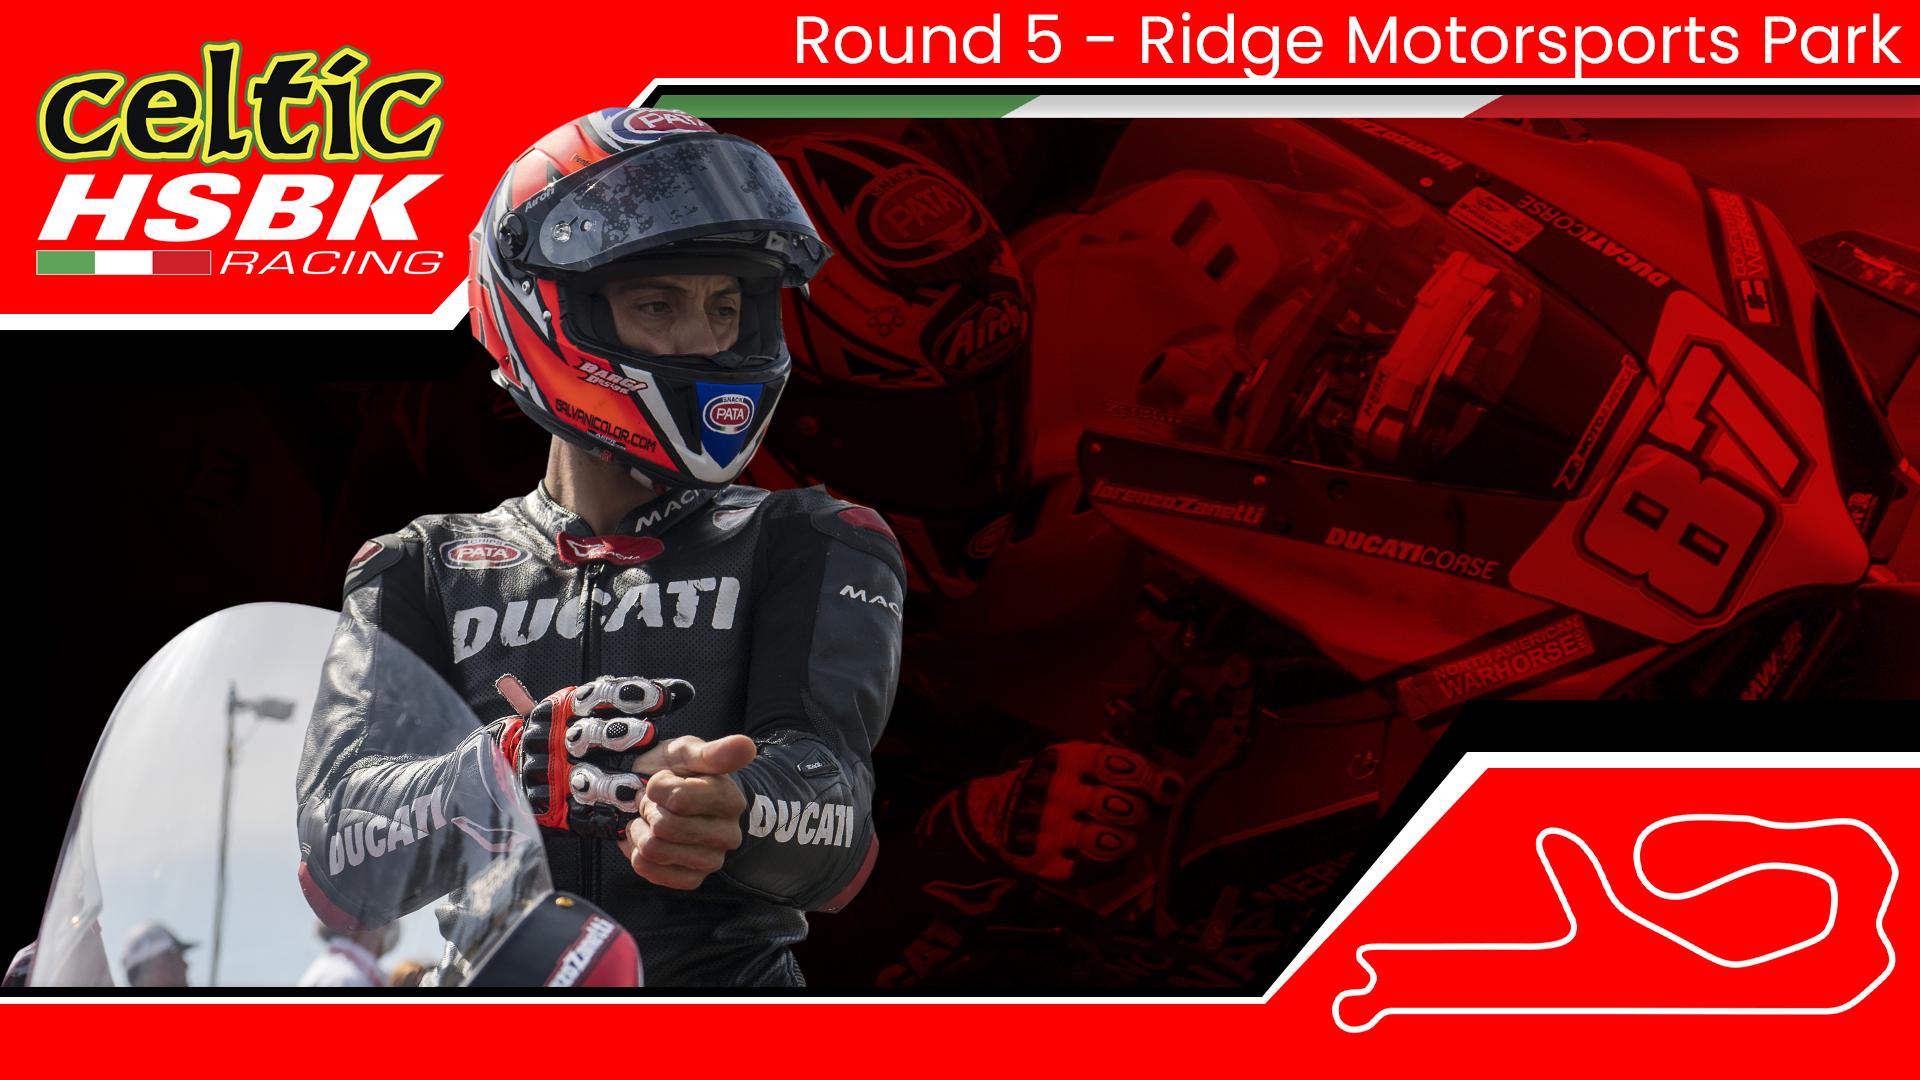 Lorenzo Zanetti joins Celtic HSBK Racing at The Ridge (2020 MotoAmerica Round 5)